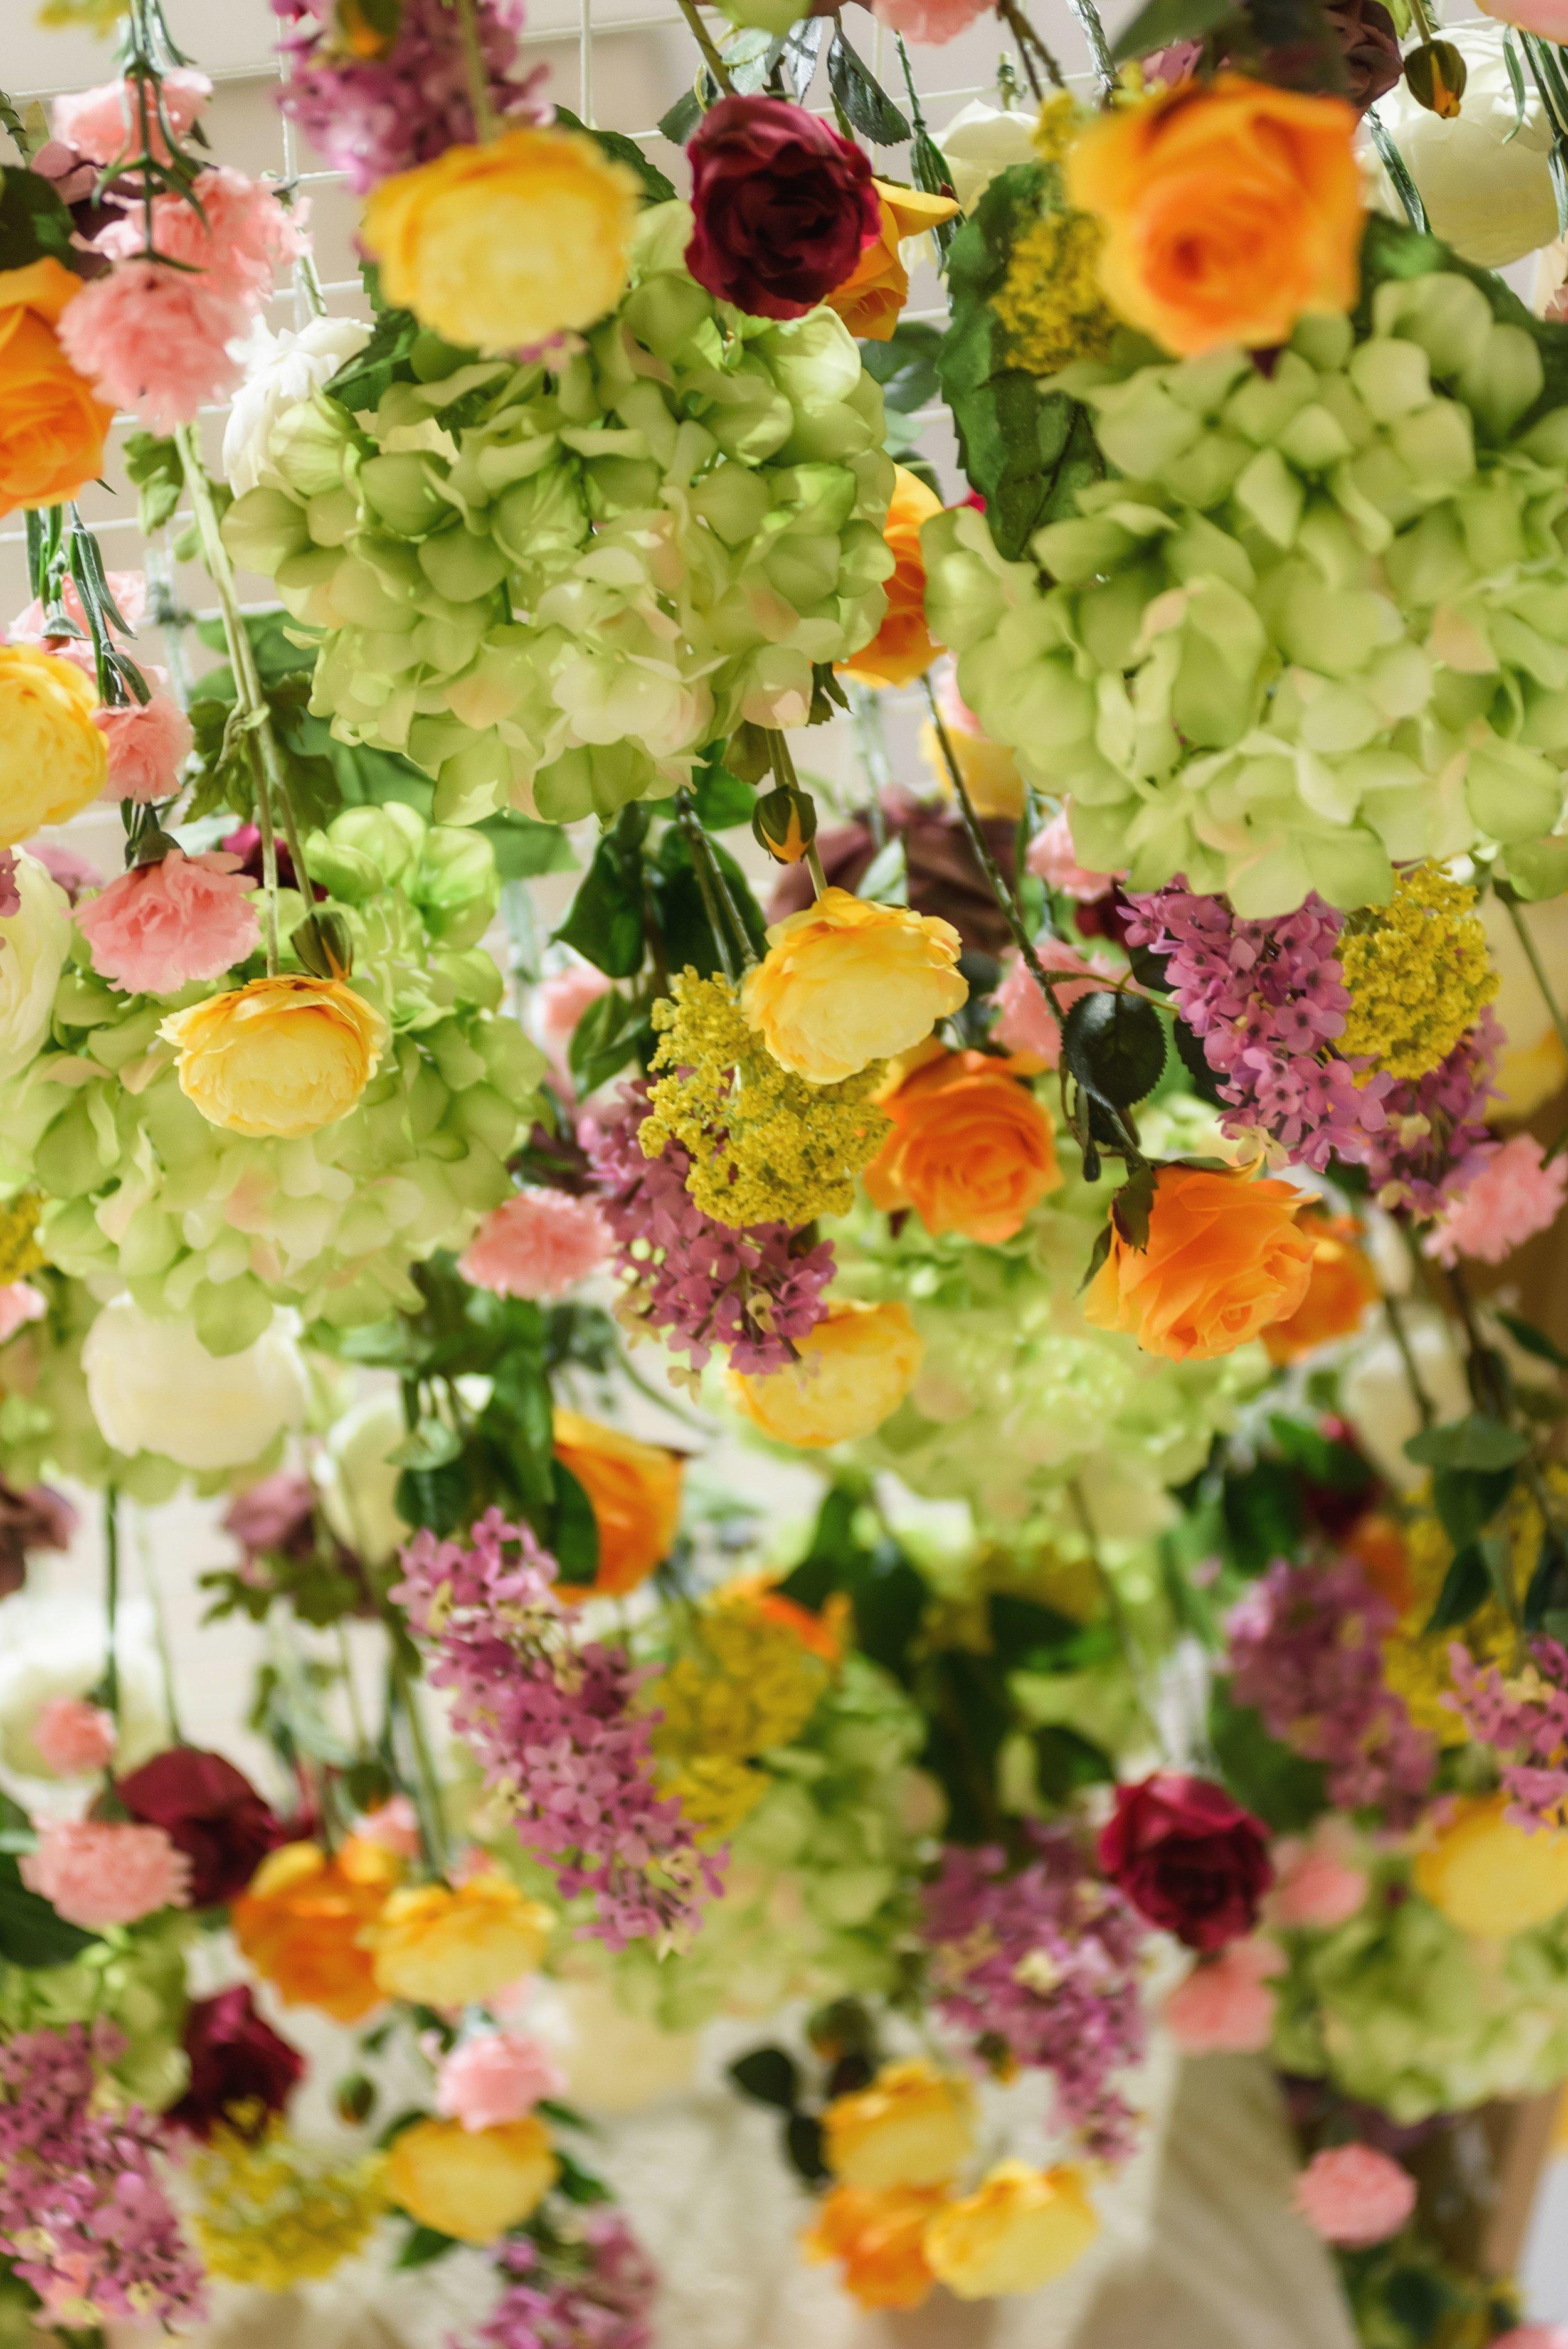 So Visualise close-up flowers L'Occitane .jpg